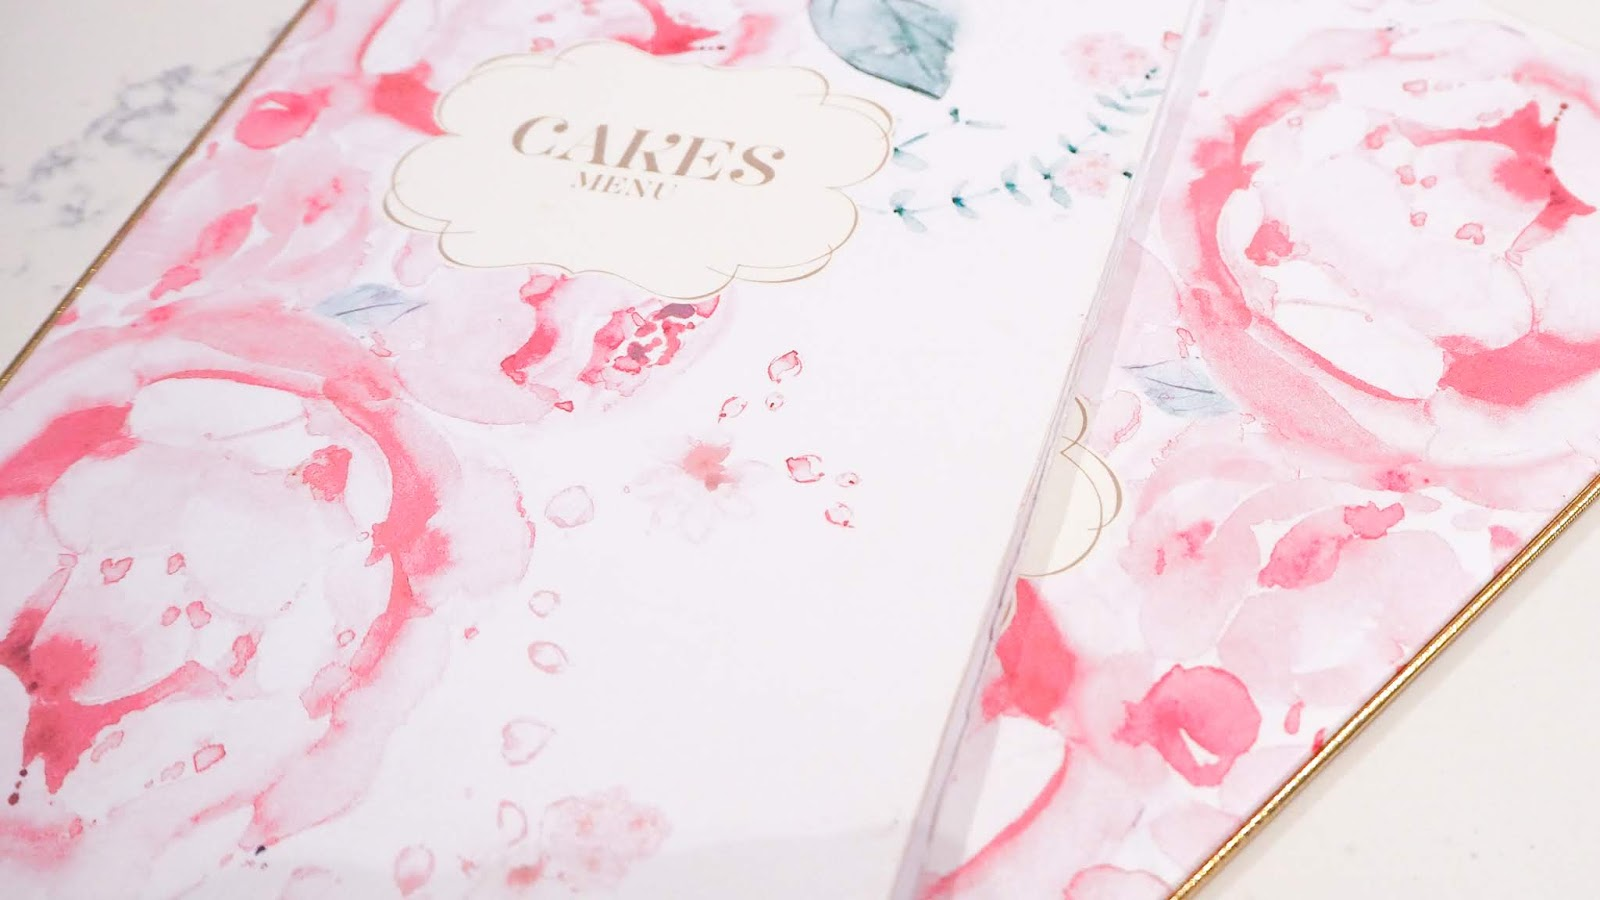 Cakes menus